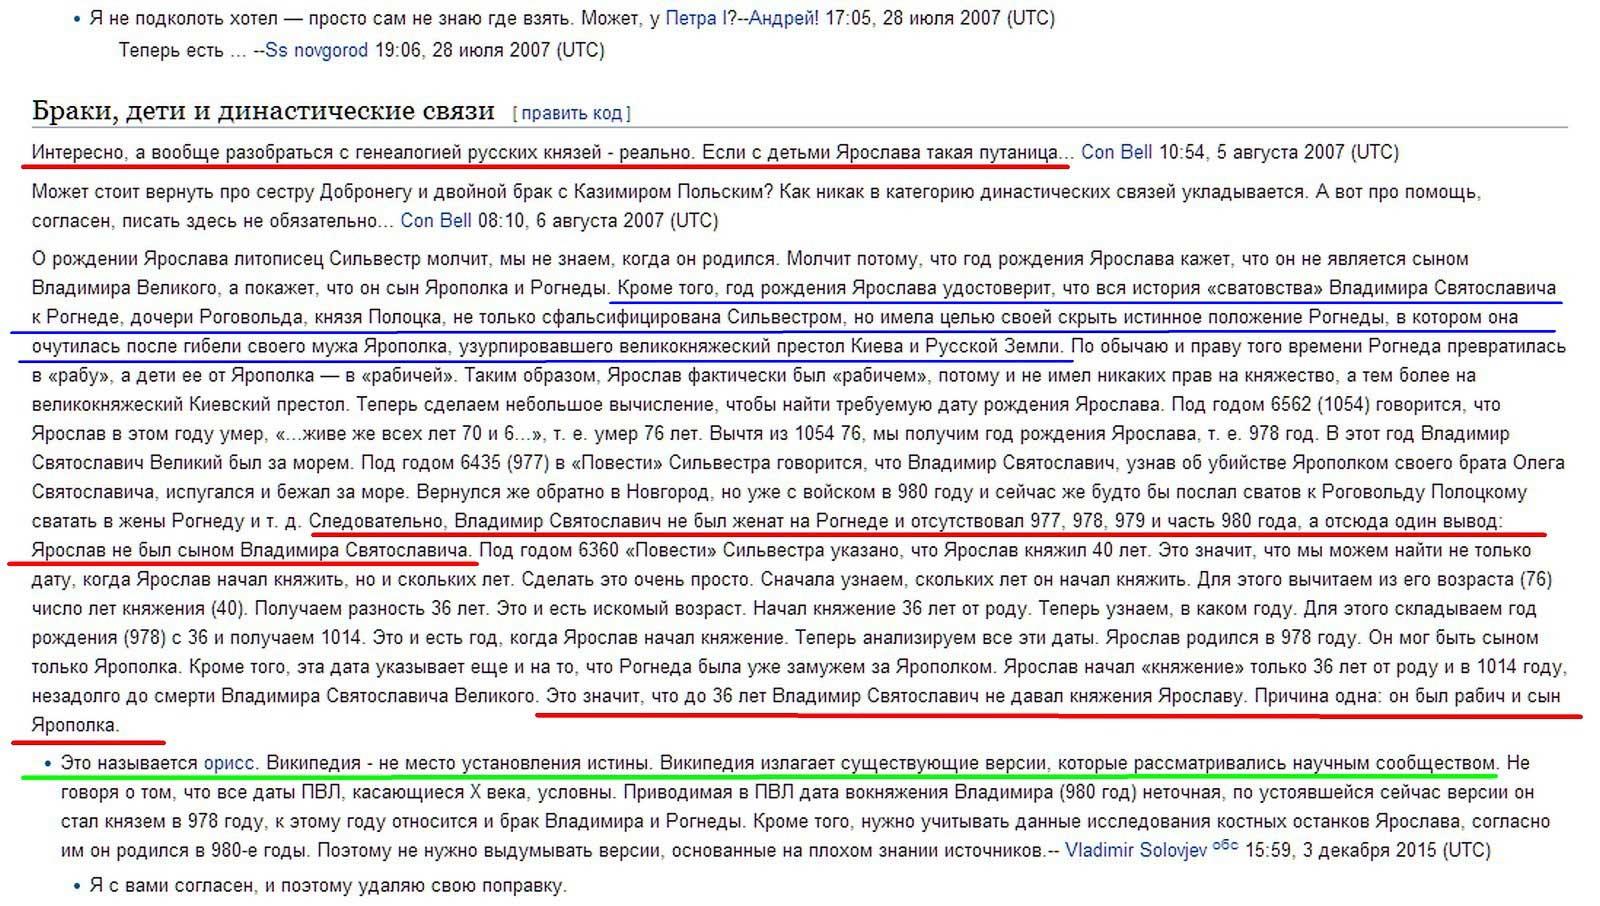 Форум Википедии